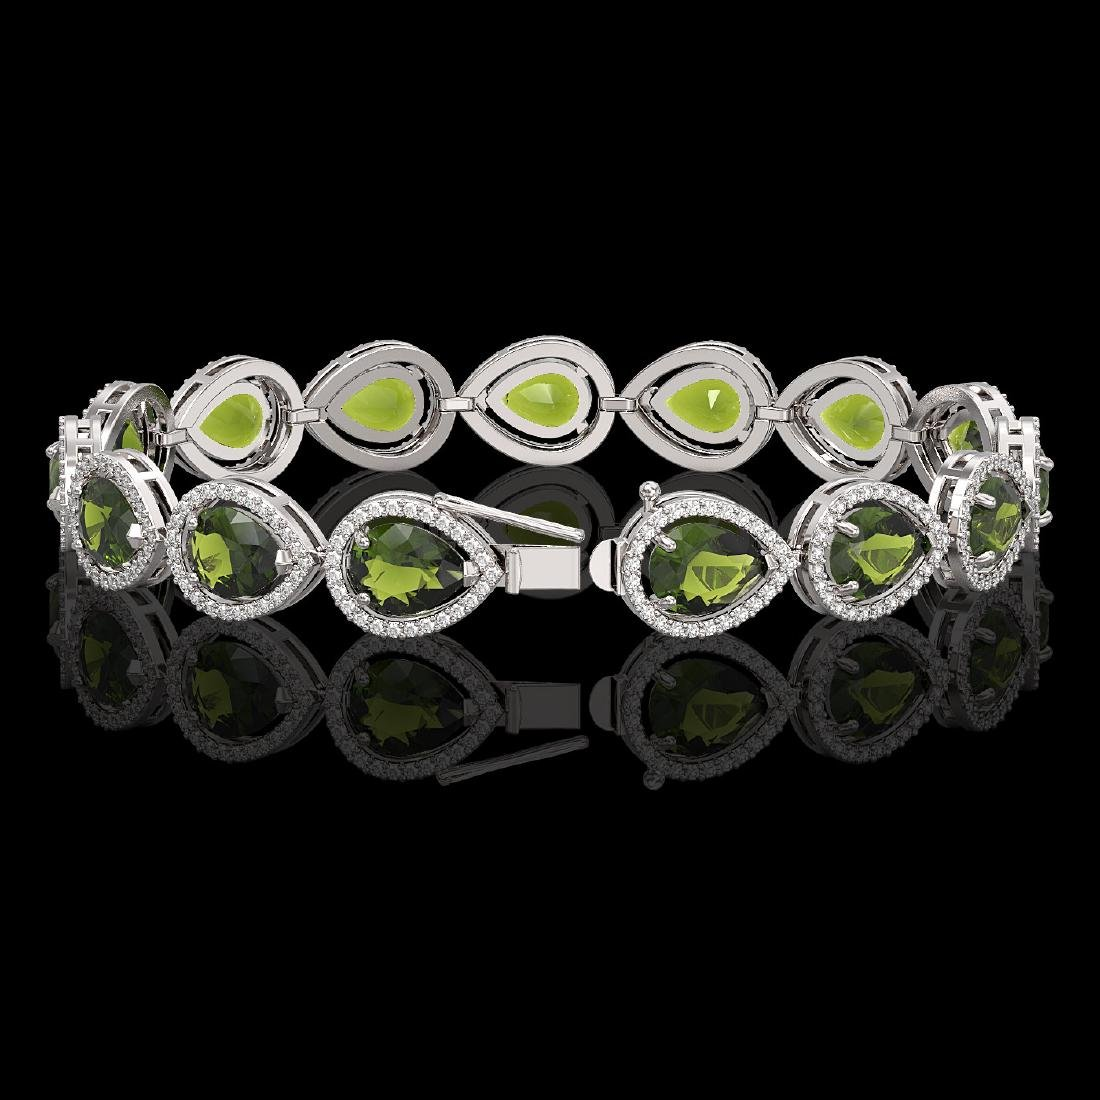 19.7 CTW Tourmaline & Diamond Halo Bracelet 10K White - 2